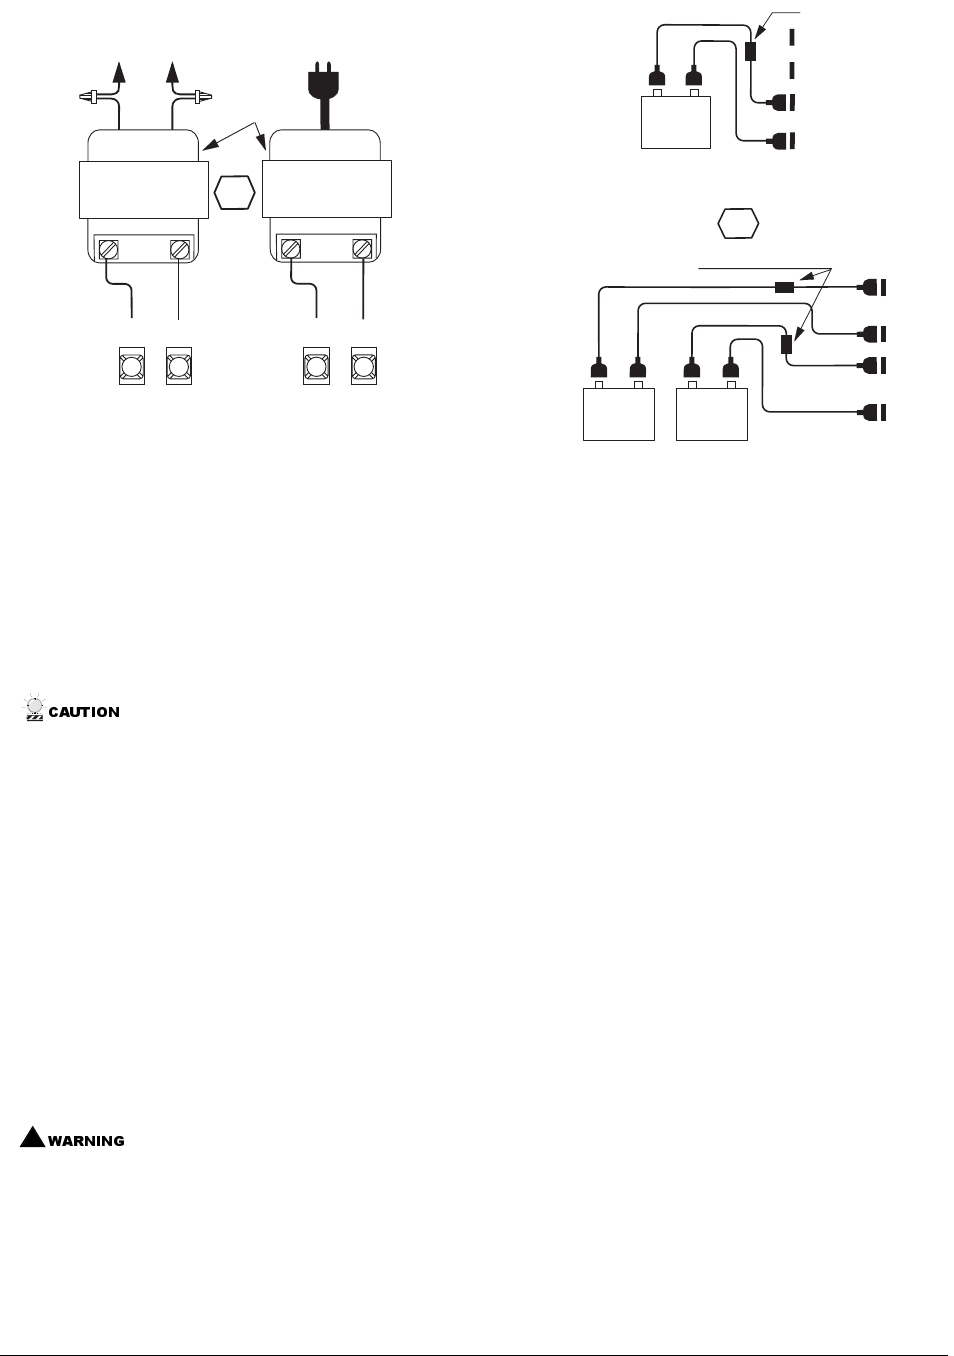 Fire Alarm Interface Unit Wiring Diagram.html